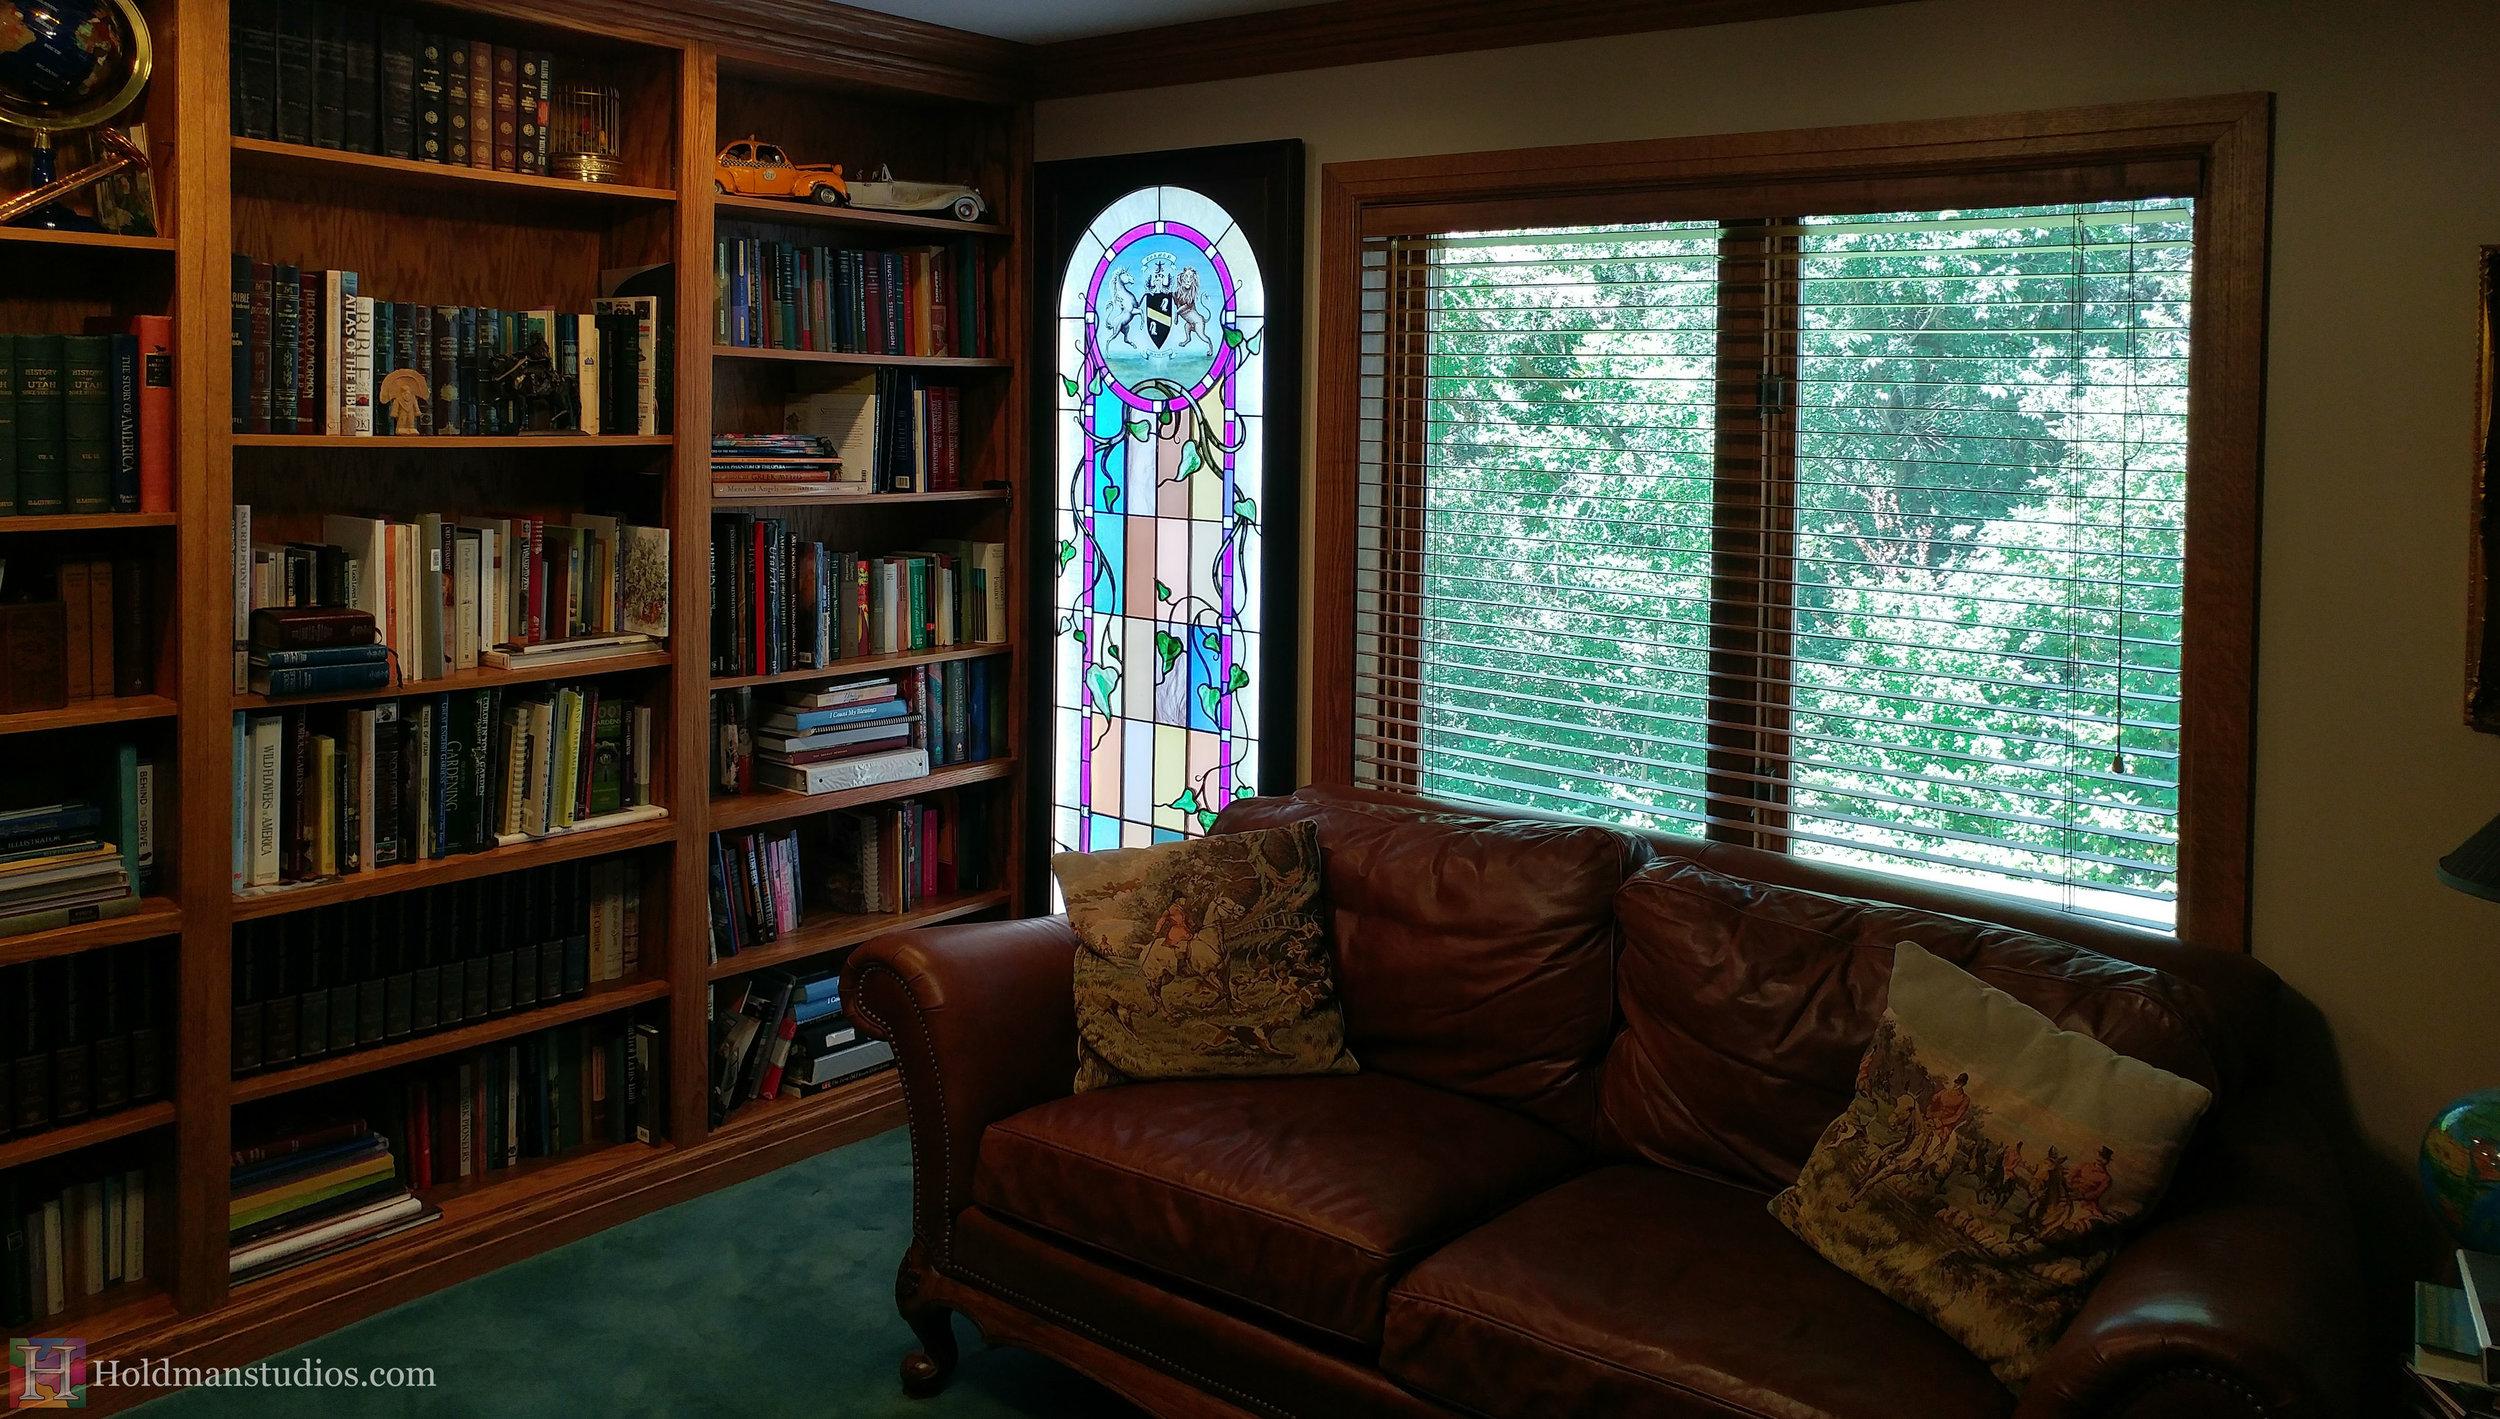 Holdman-studios-stained-glass-study-window-per-ardus-surgo-vine-leaves-plants-lion-unicorn-coat-of-arms-2.jpg